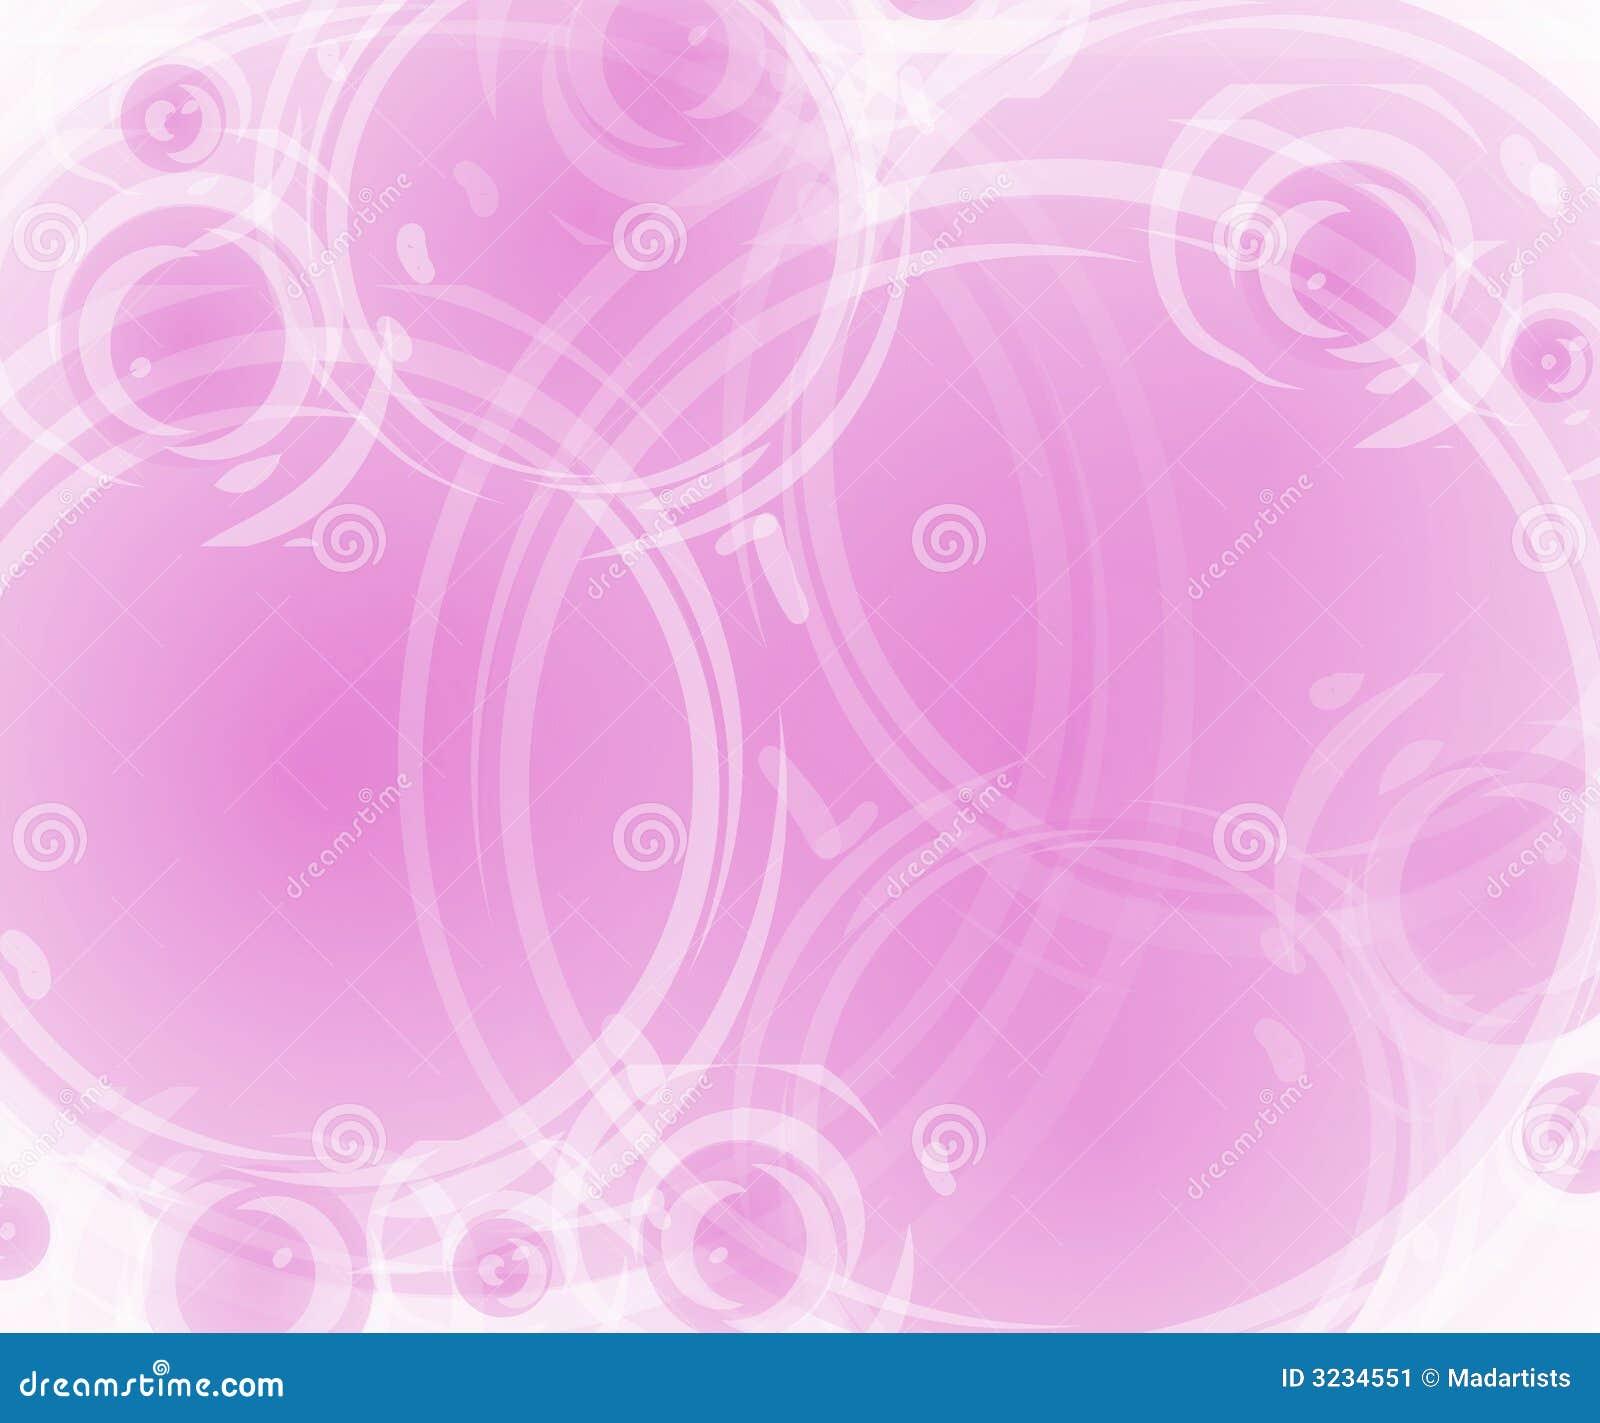 Artsy背景不透明的粉红色